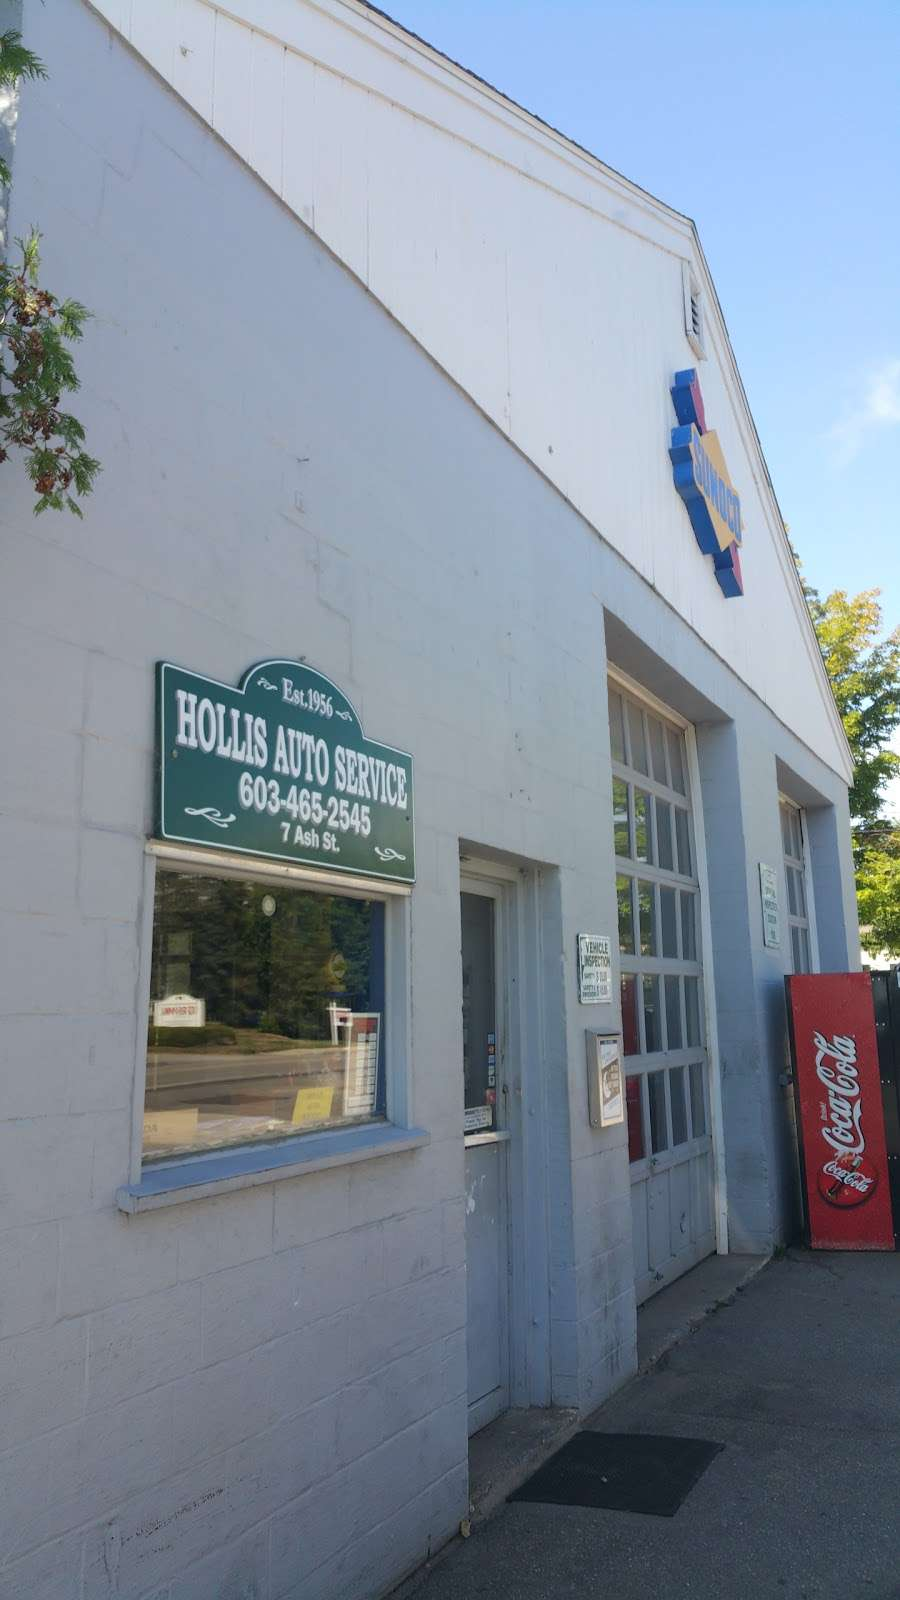 Sunoco Gas Station - gas station  | Photo 1 of 3 | Address: 7 Ash St, Hollis, NH 03049, USA | Phone: (603) 465-2545